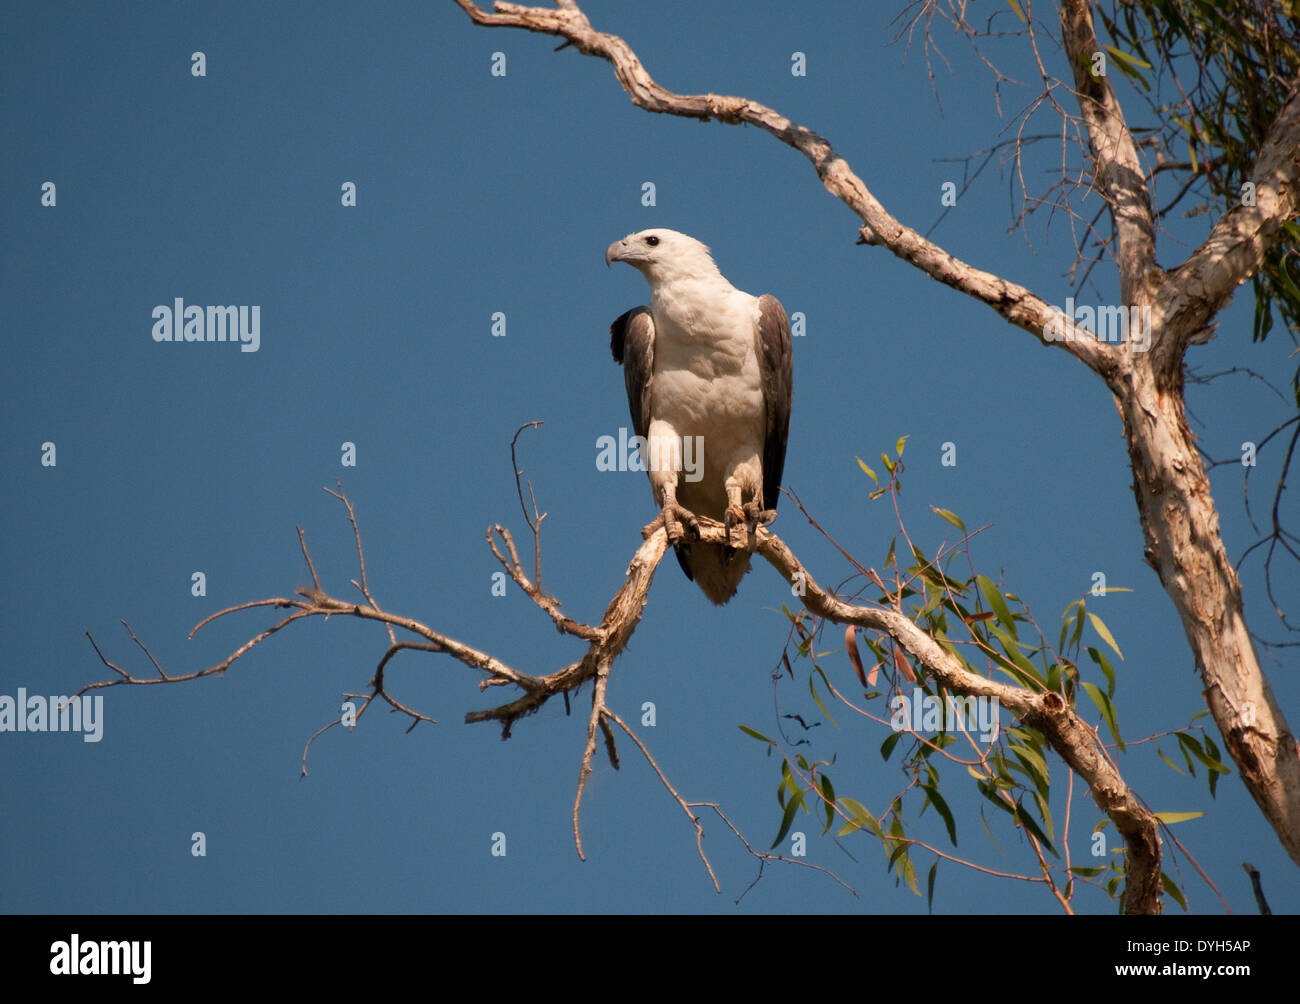 White-bellied Sea Eagle (Haliaeetus leucogaster), South Alligator River, Kakadu National Park, Australia Stock Photo